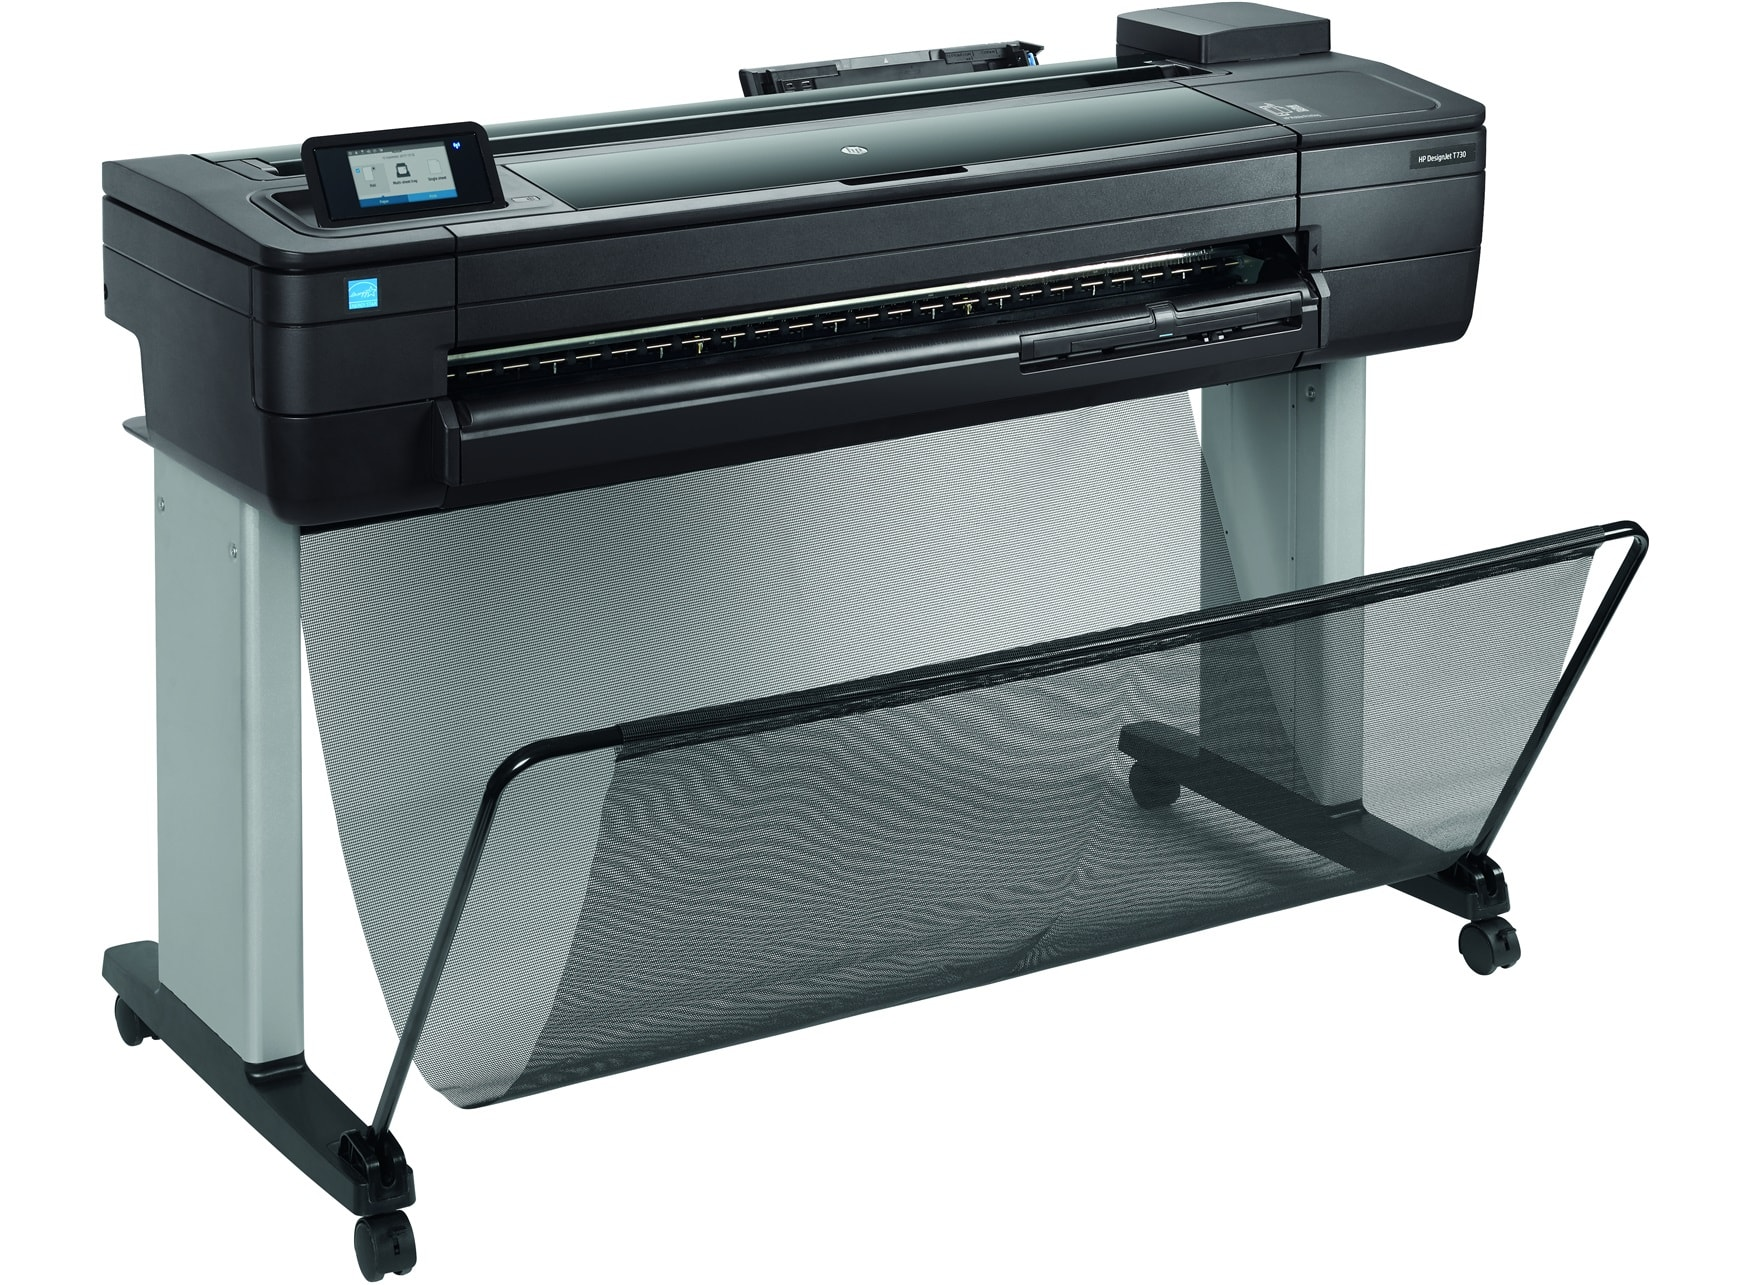 "Imprimante HP DesignJet T730 36"" - Cybertek.fr - 2"